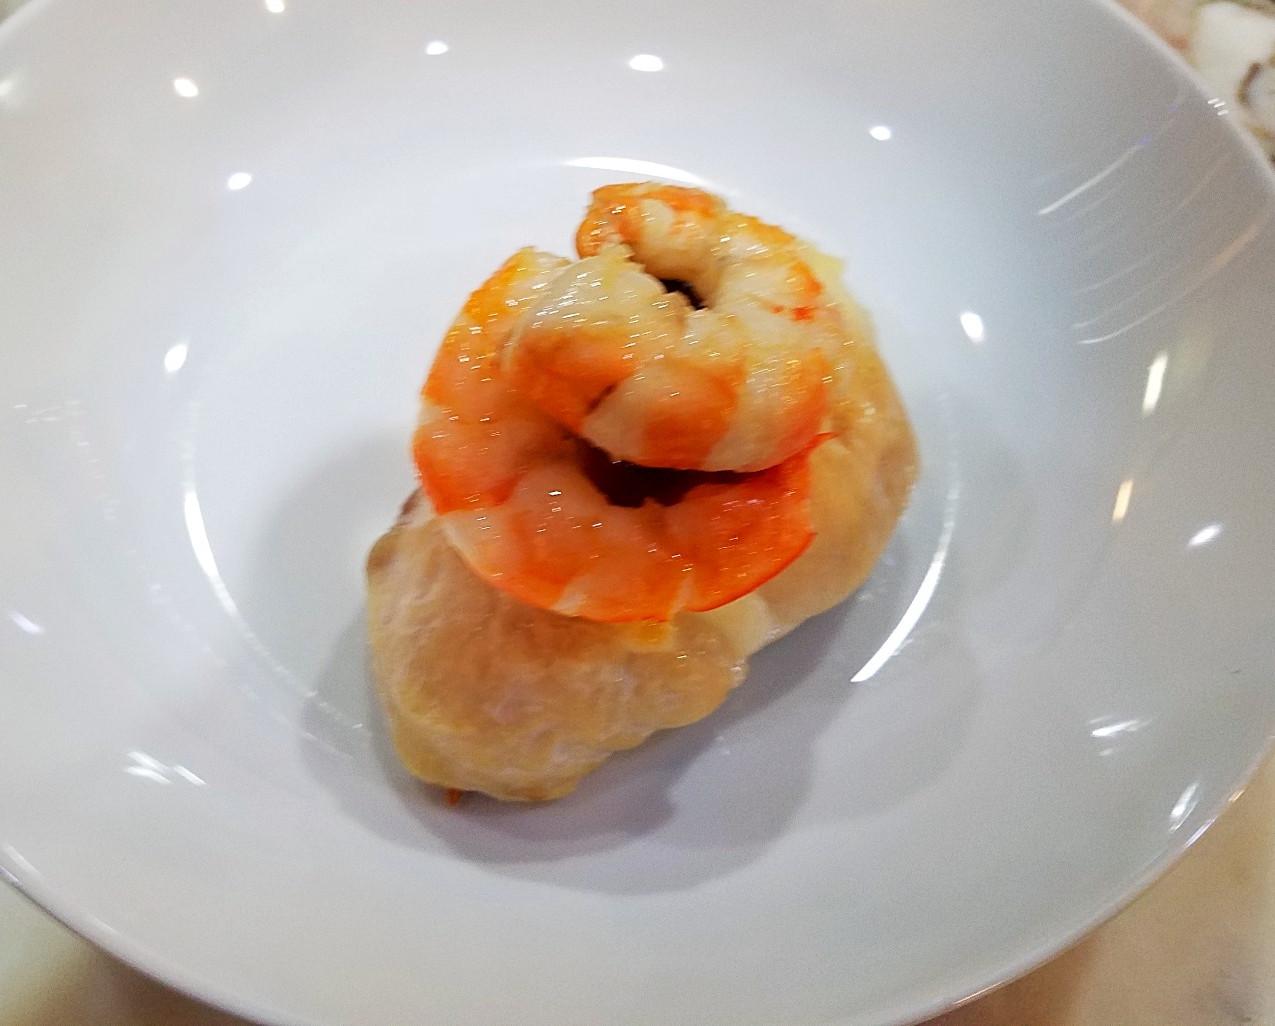 Shrimp topped stuffed chicken